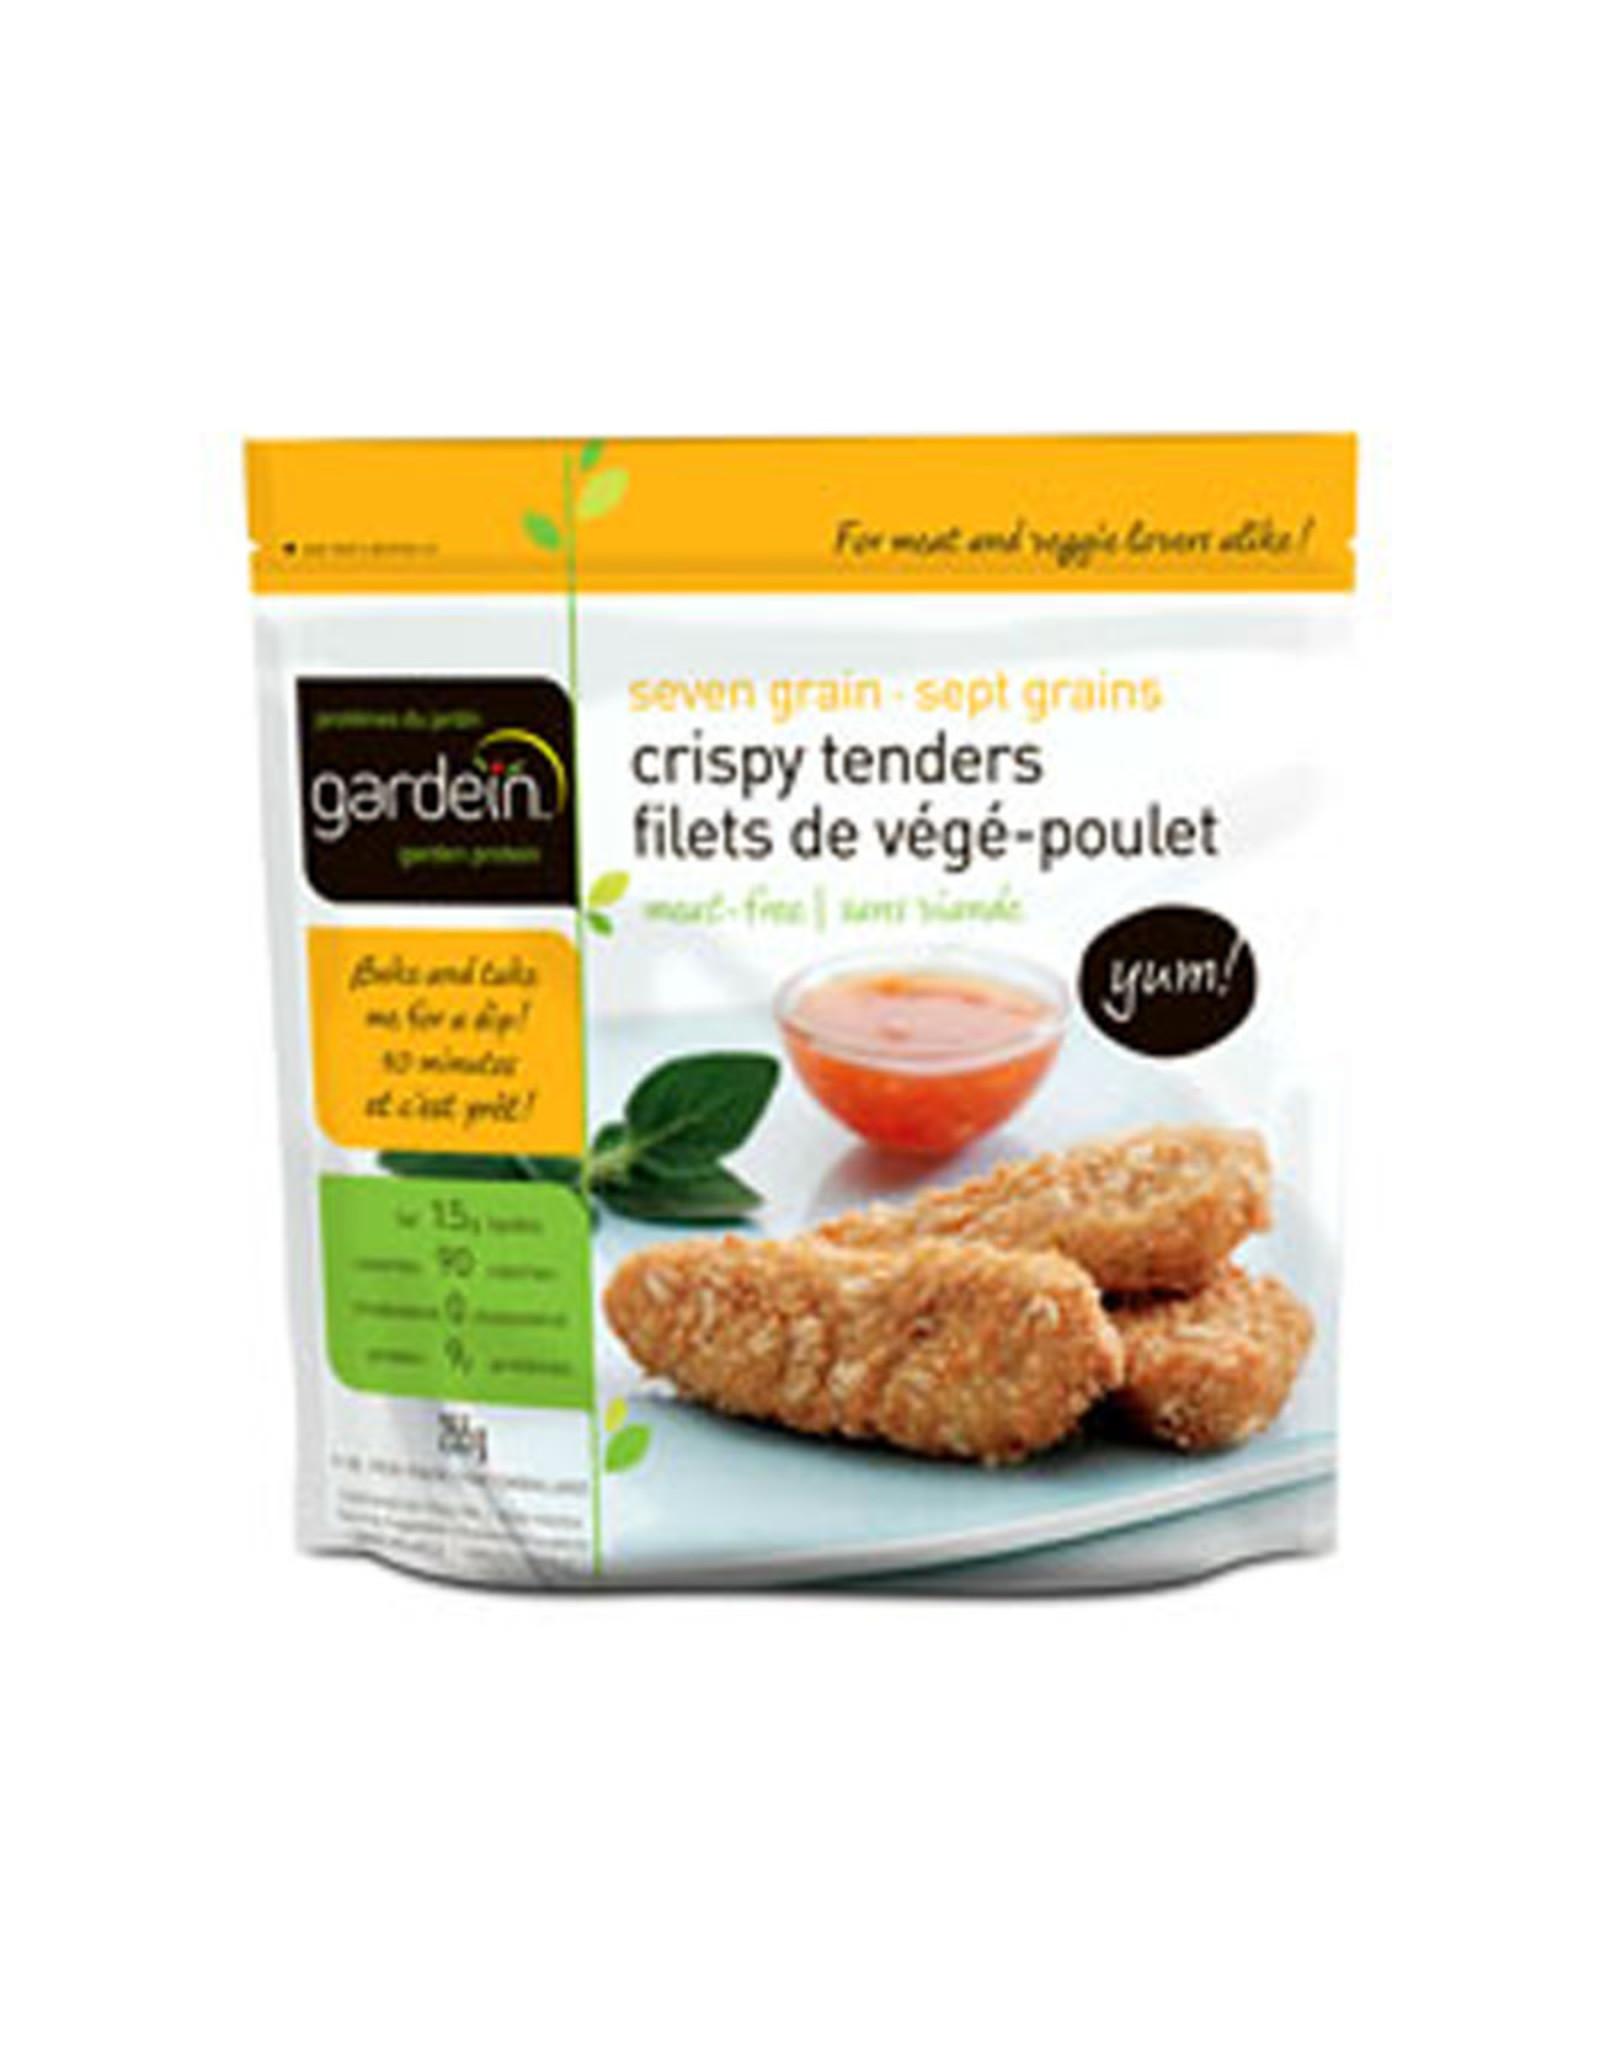 Gardein Gardein - Produit Végétalien, Filets Croustillants 7 Grains (225g)